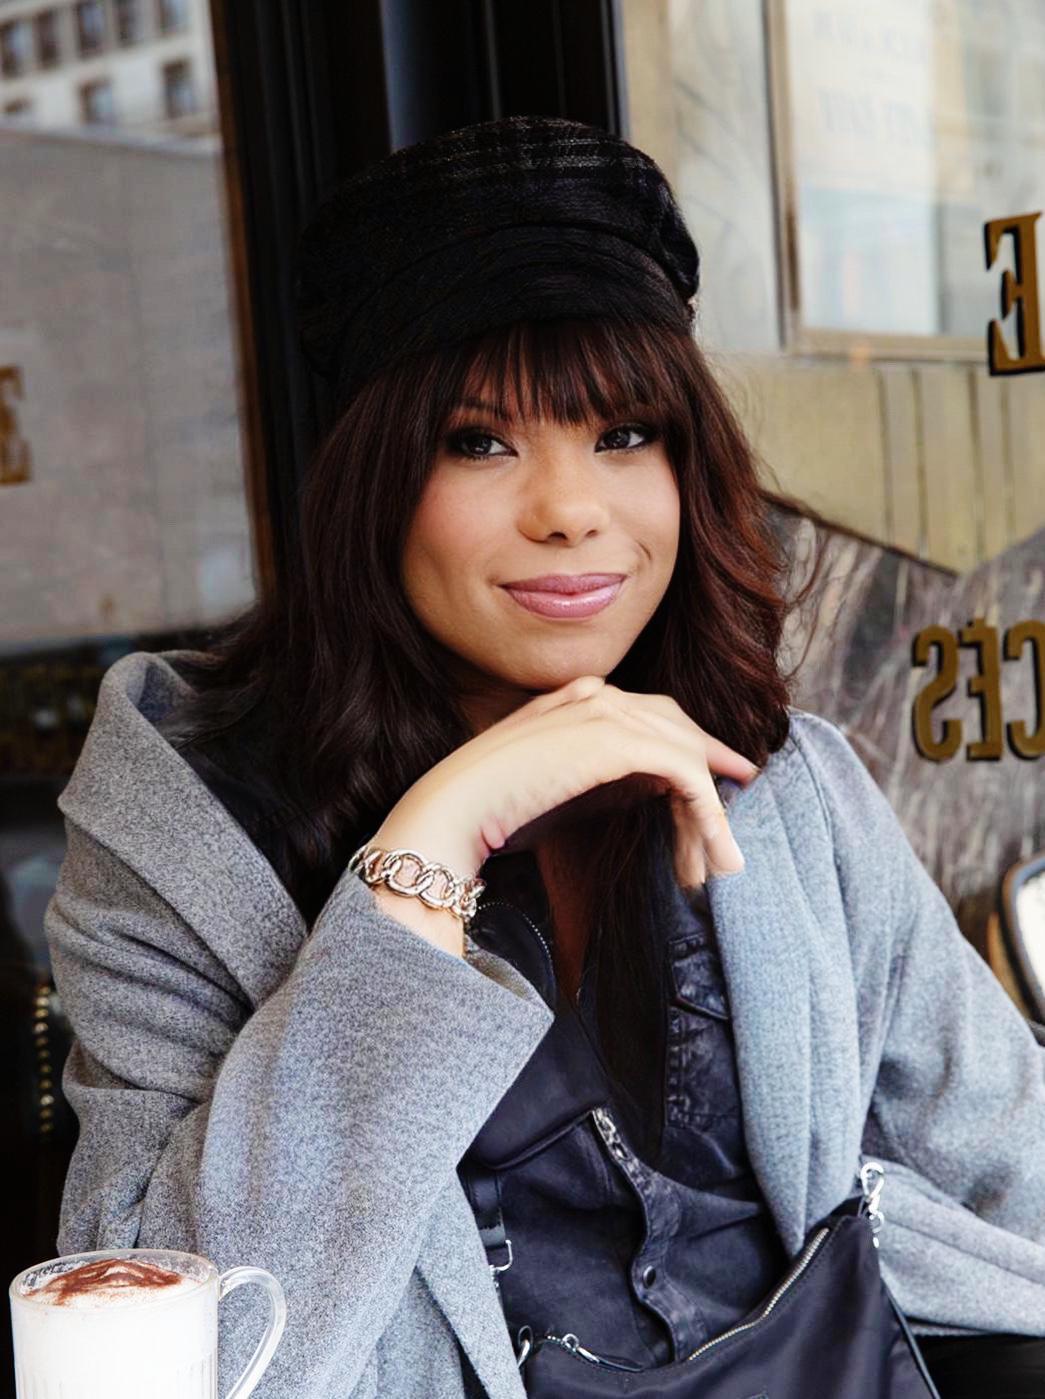 Valentina Saluz sorri para a câmera. Veste blusa cinza e chapéu preto.